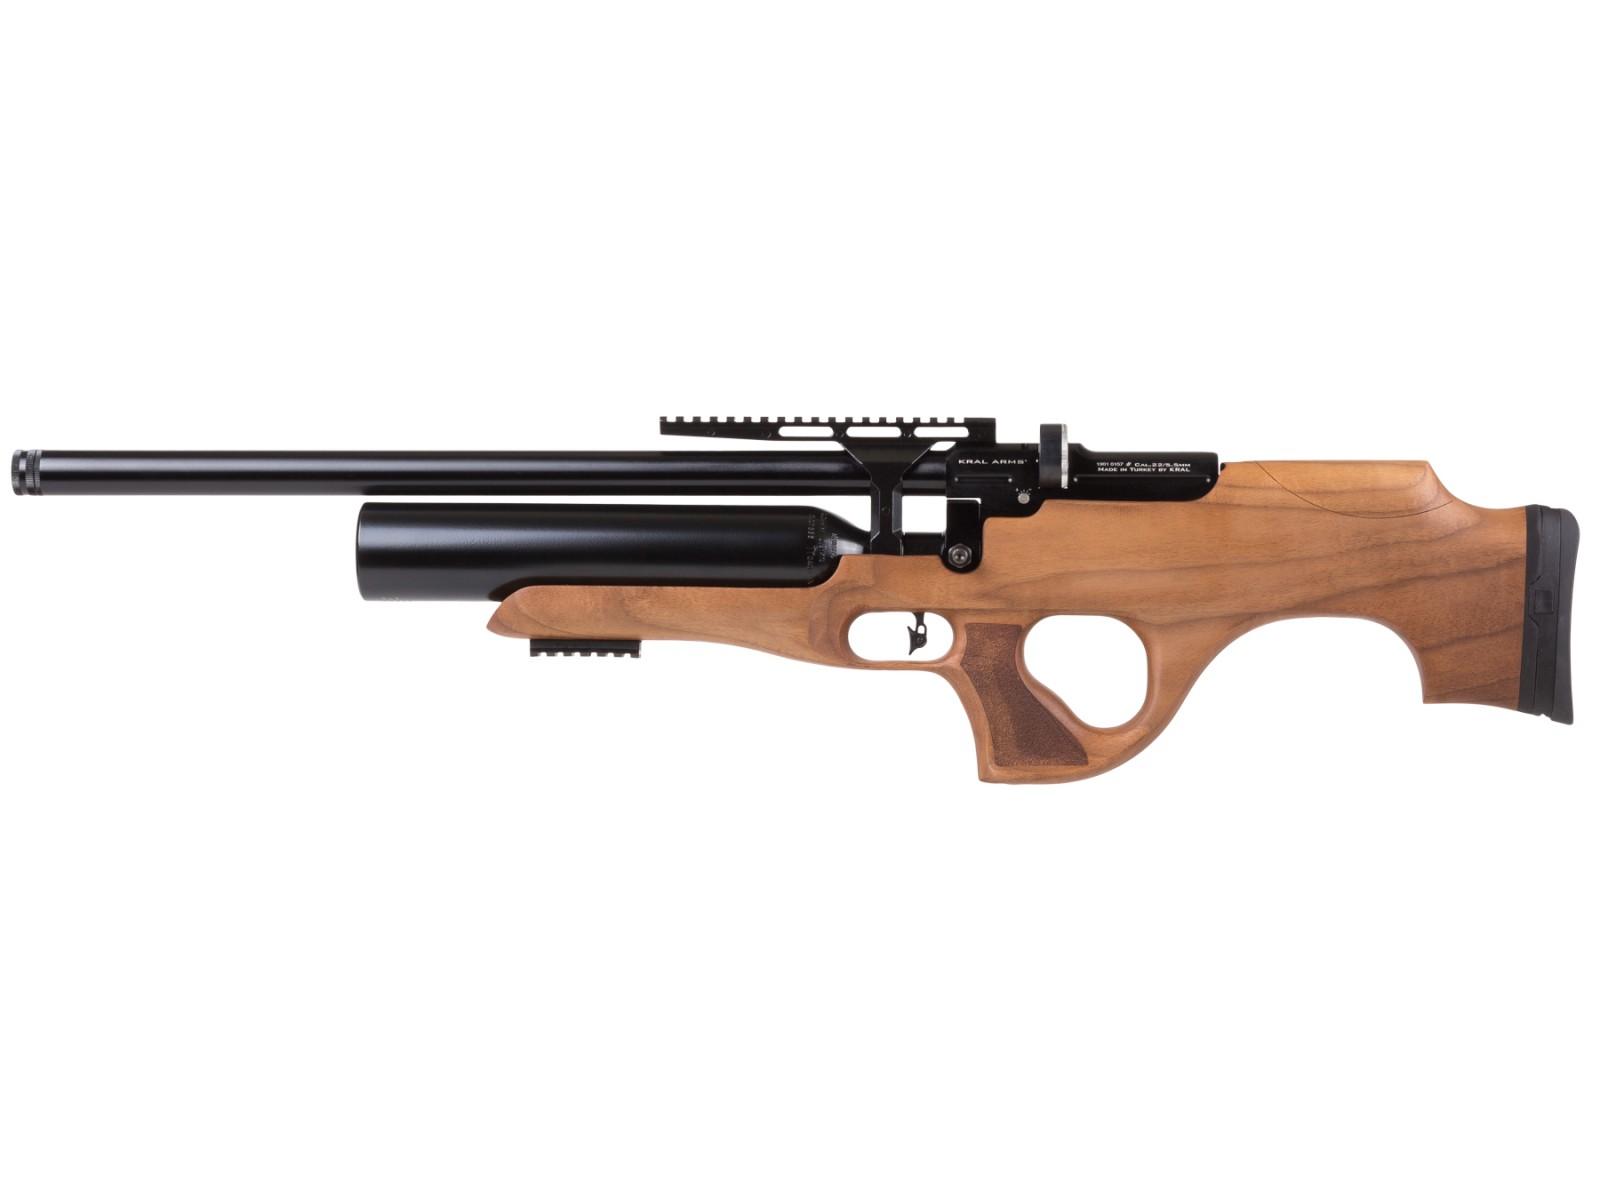 Cheap Kral Puncher Knight W PCP Air Rifle, Turkish Walnut Stock 0.25